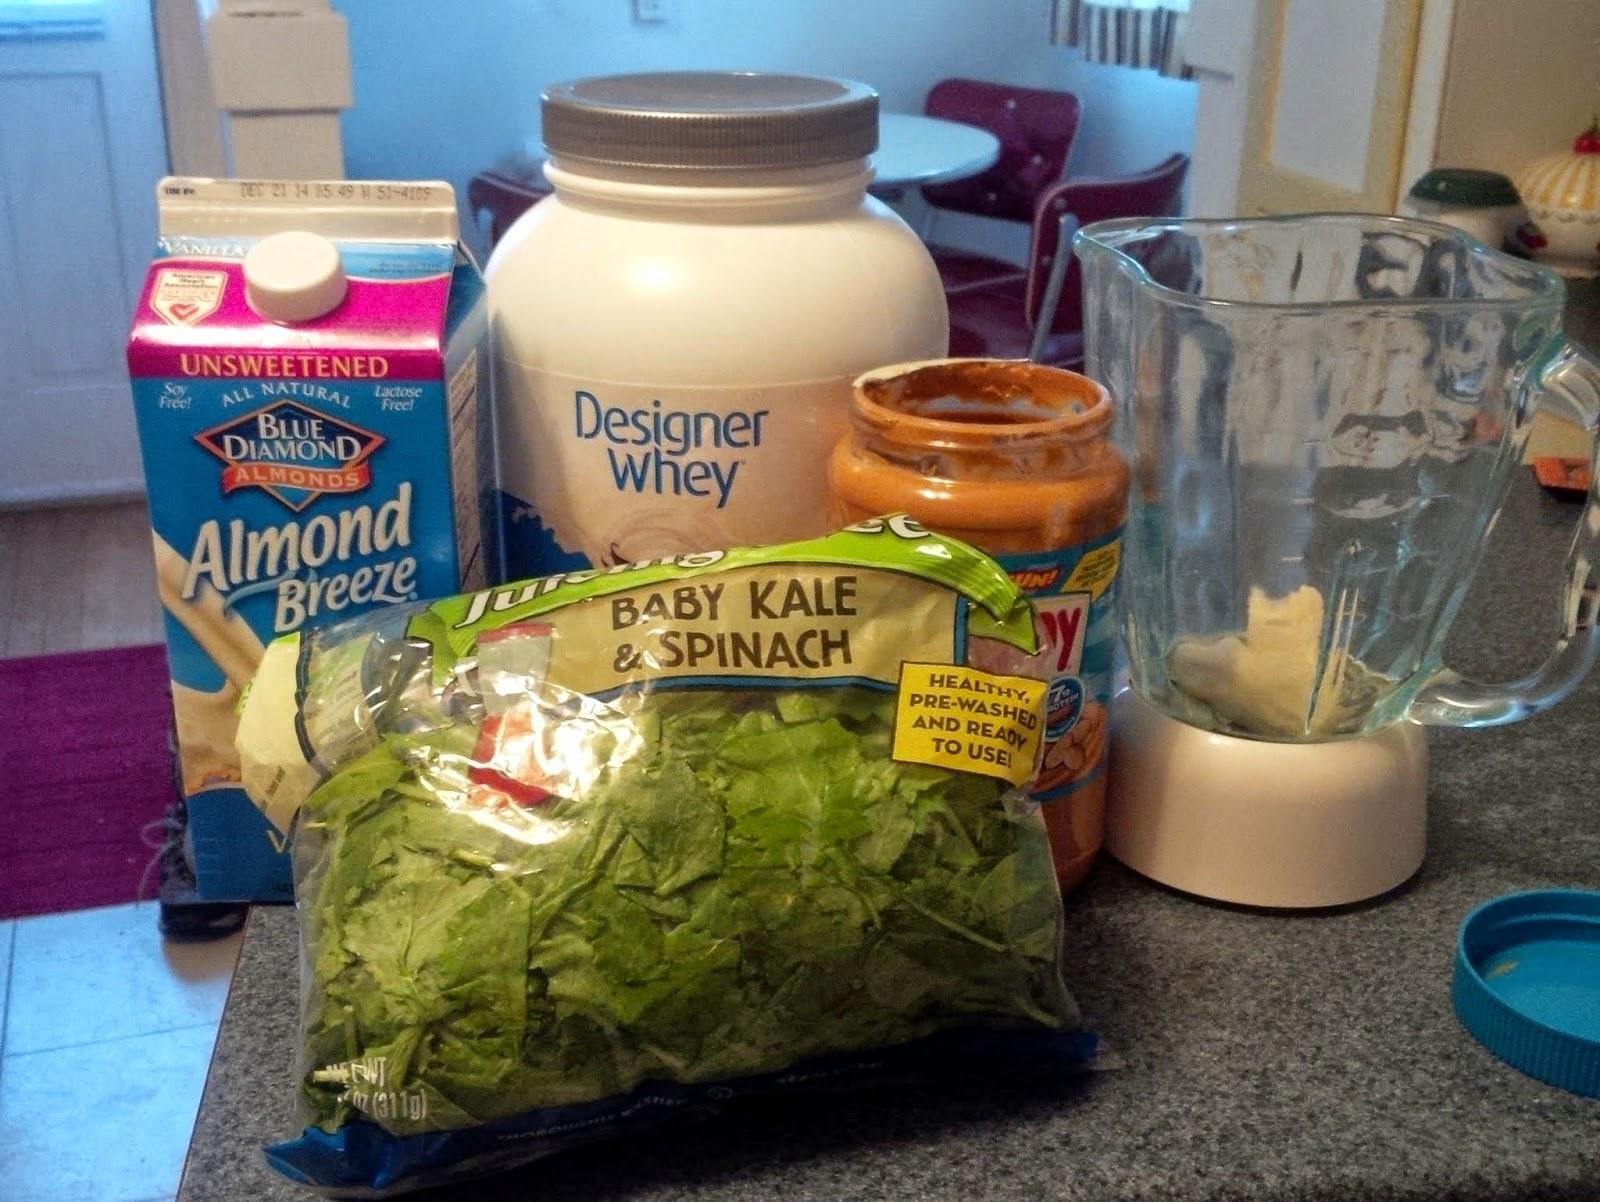 Best post-workout smoothie ingredients